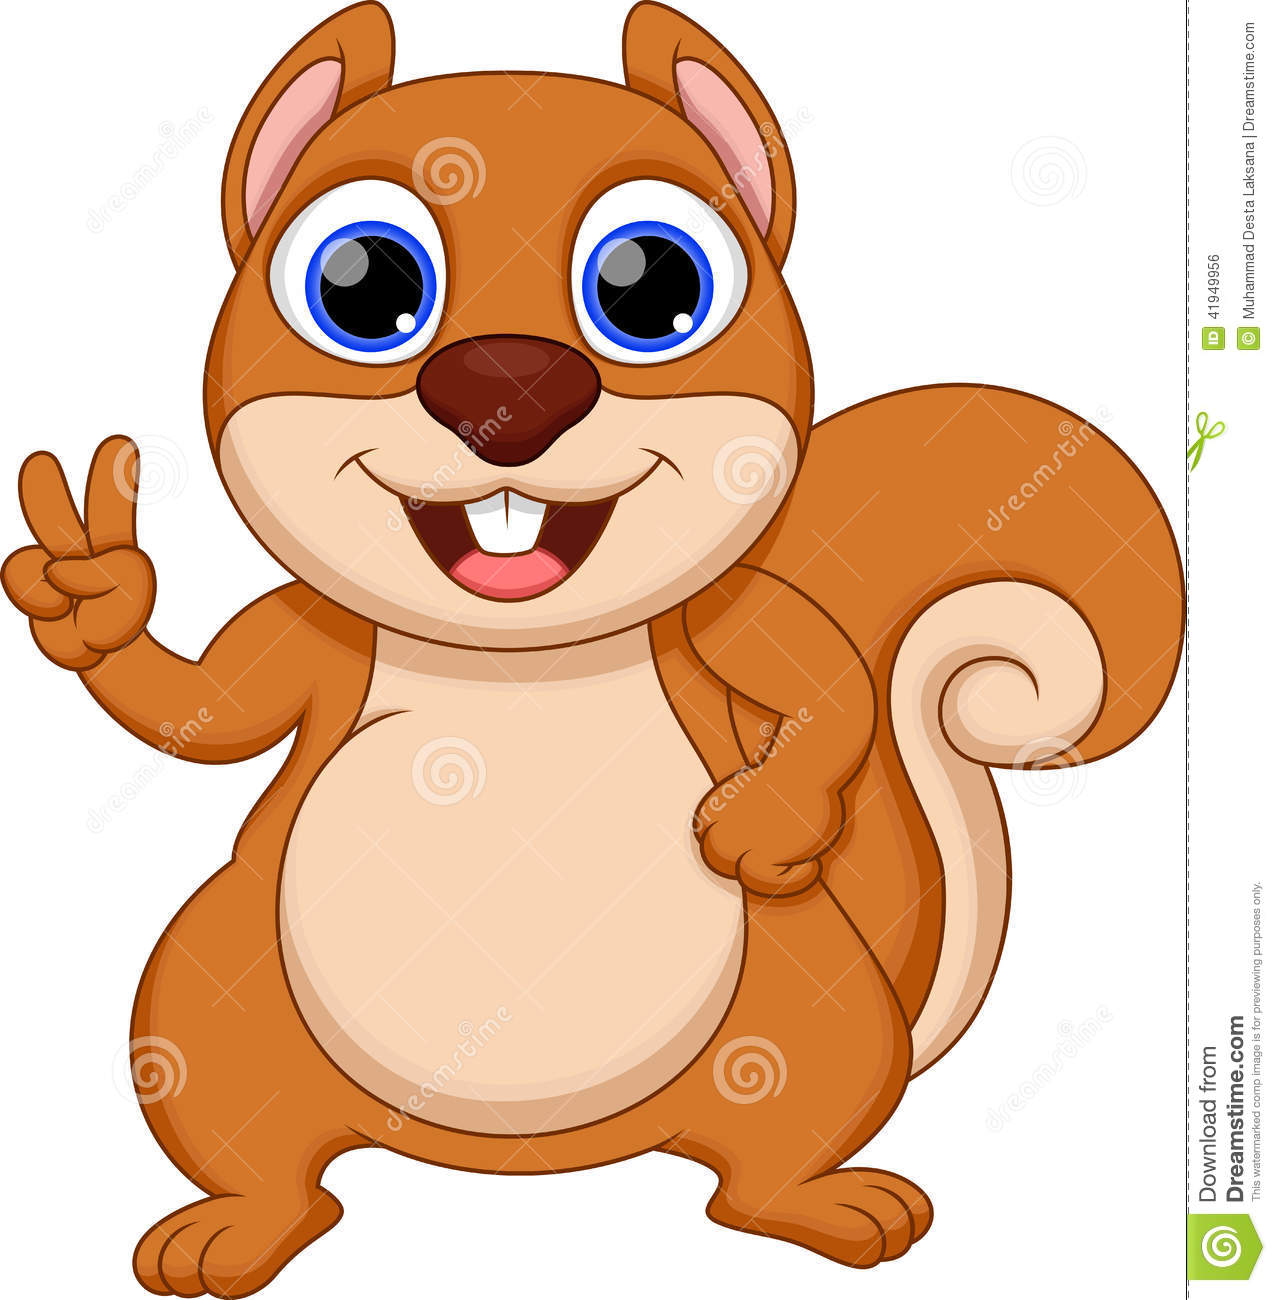 clip art cartoon squirrel - photo #50